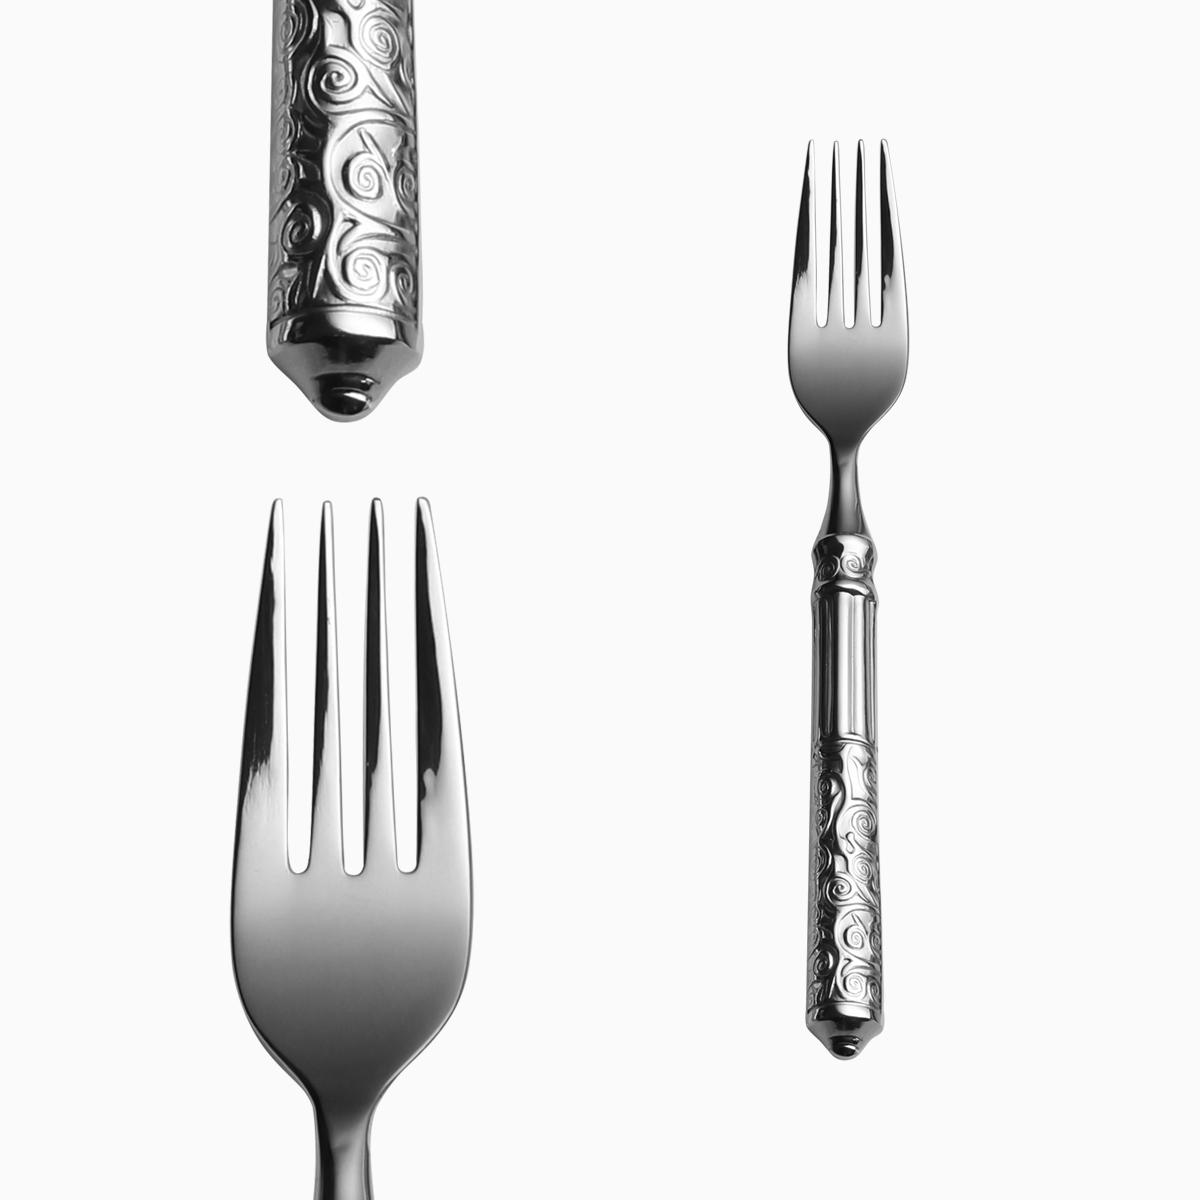 Table fork - Santa Monica